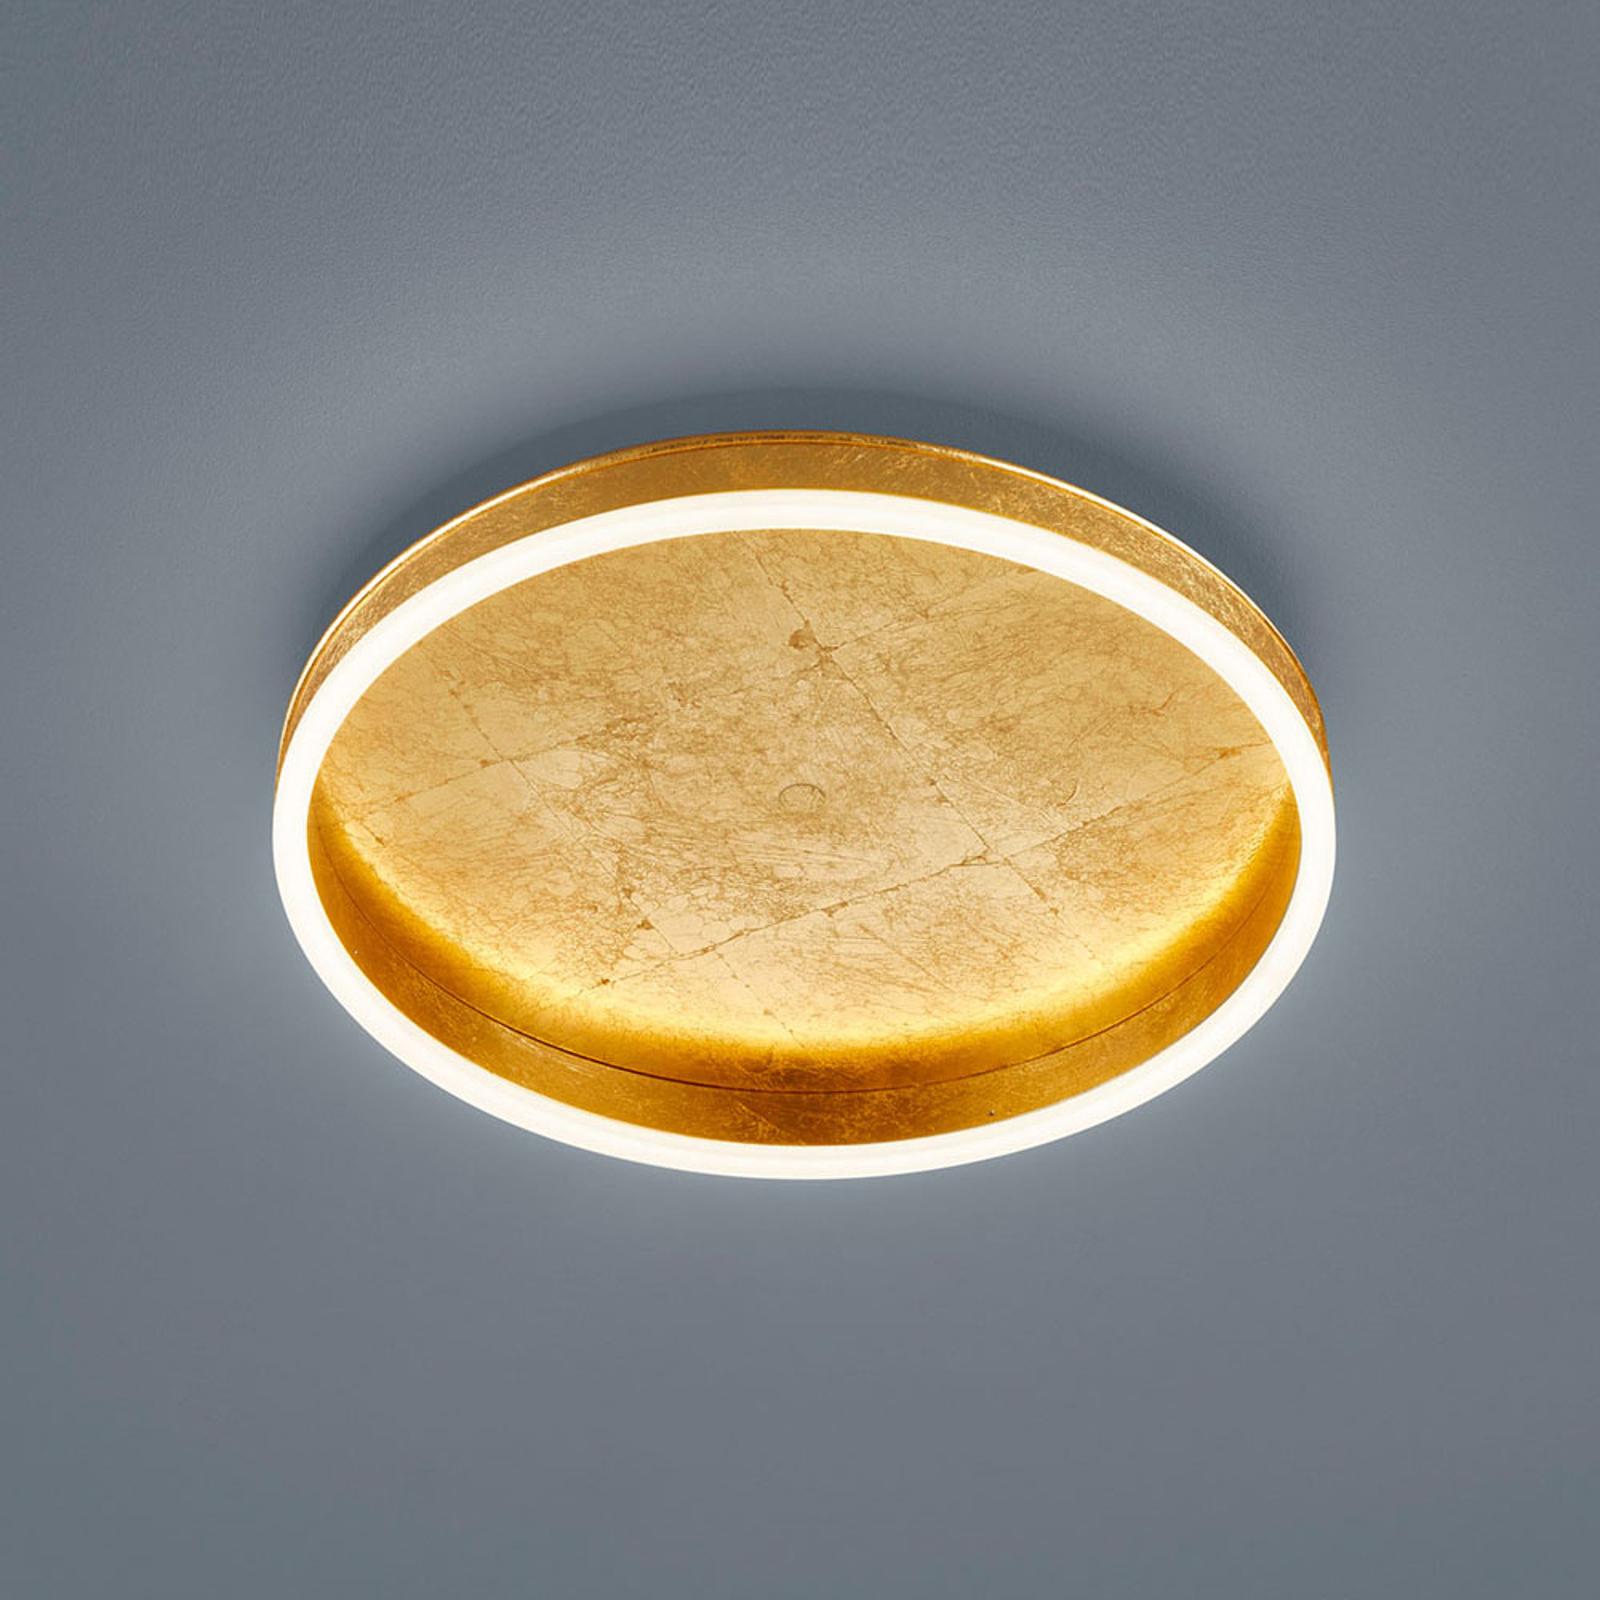 Helestra Sona LED-taklampe dimbar, Ø40cm gull